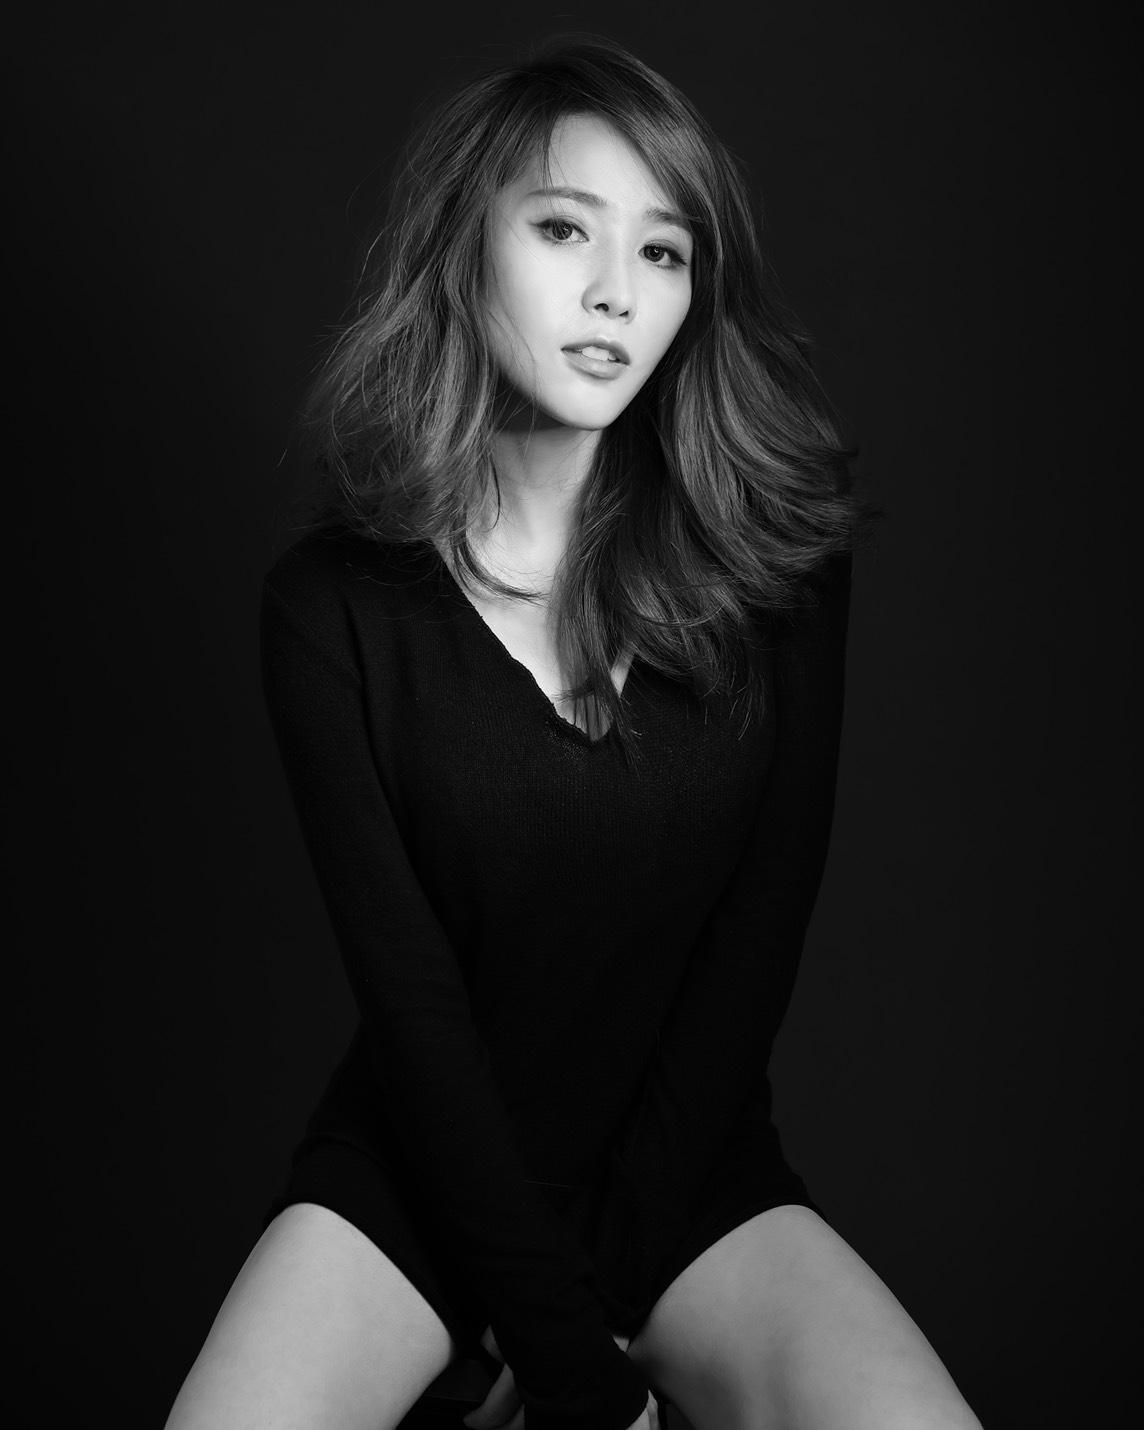 ▼Ella透露林志玲與老公AKIRA互動甜蜜,兩人是「俊男美女」的組合。(圖/鏡週刊)